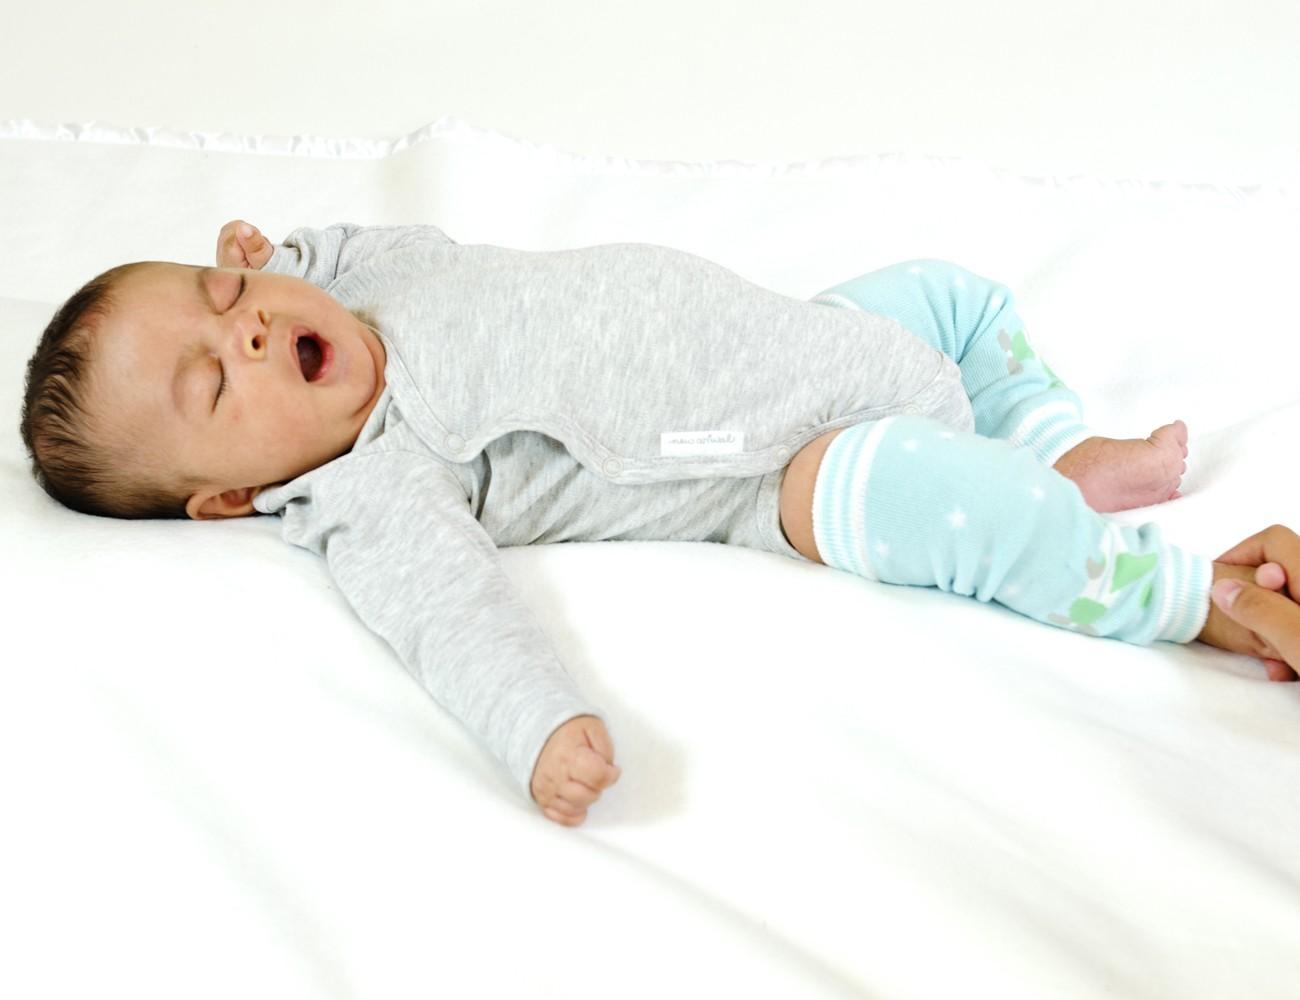 babylegs-newborn-orville-baby.jpg